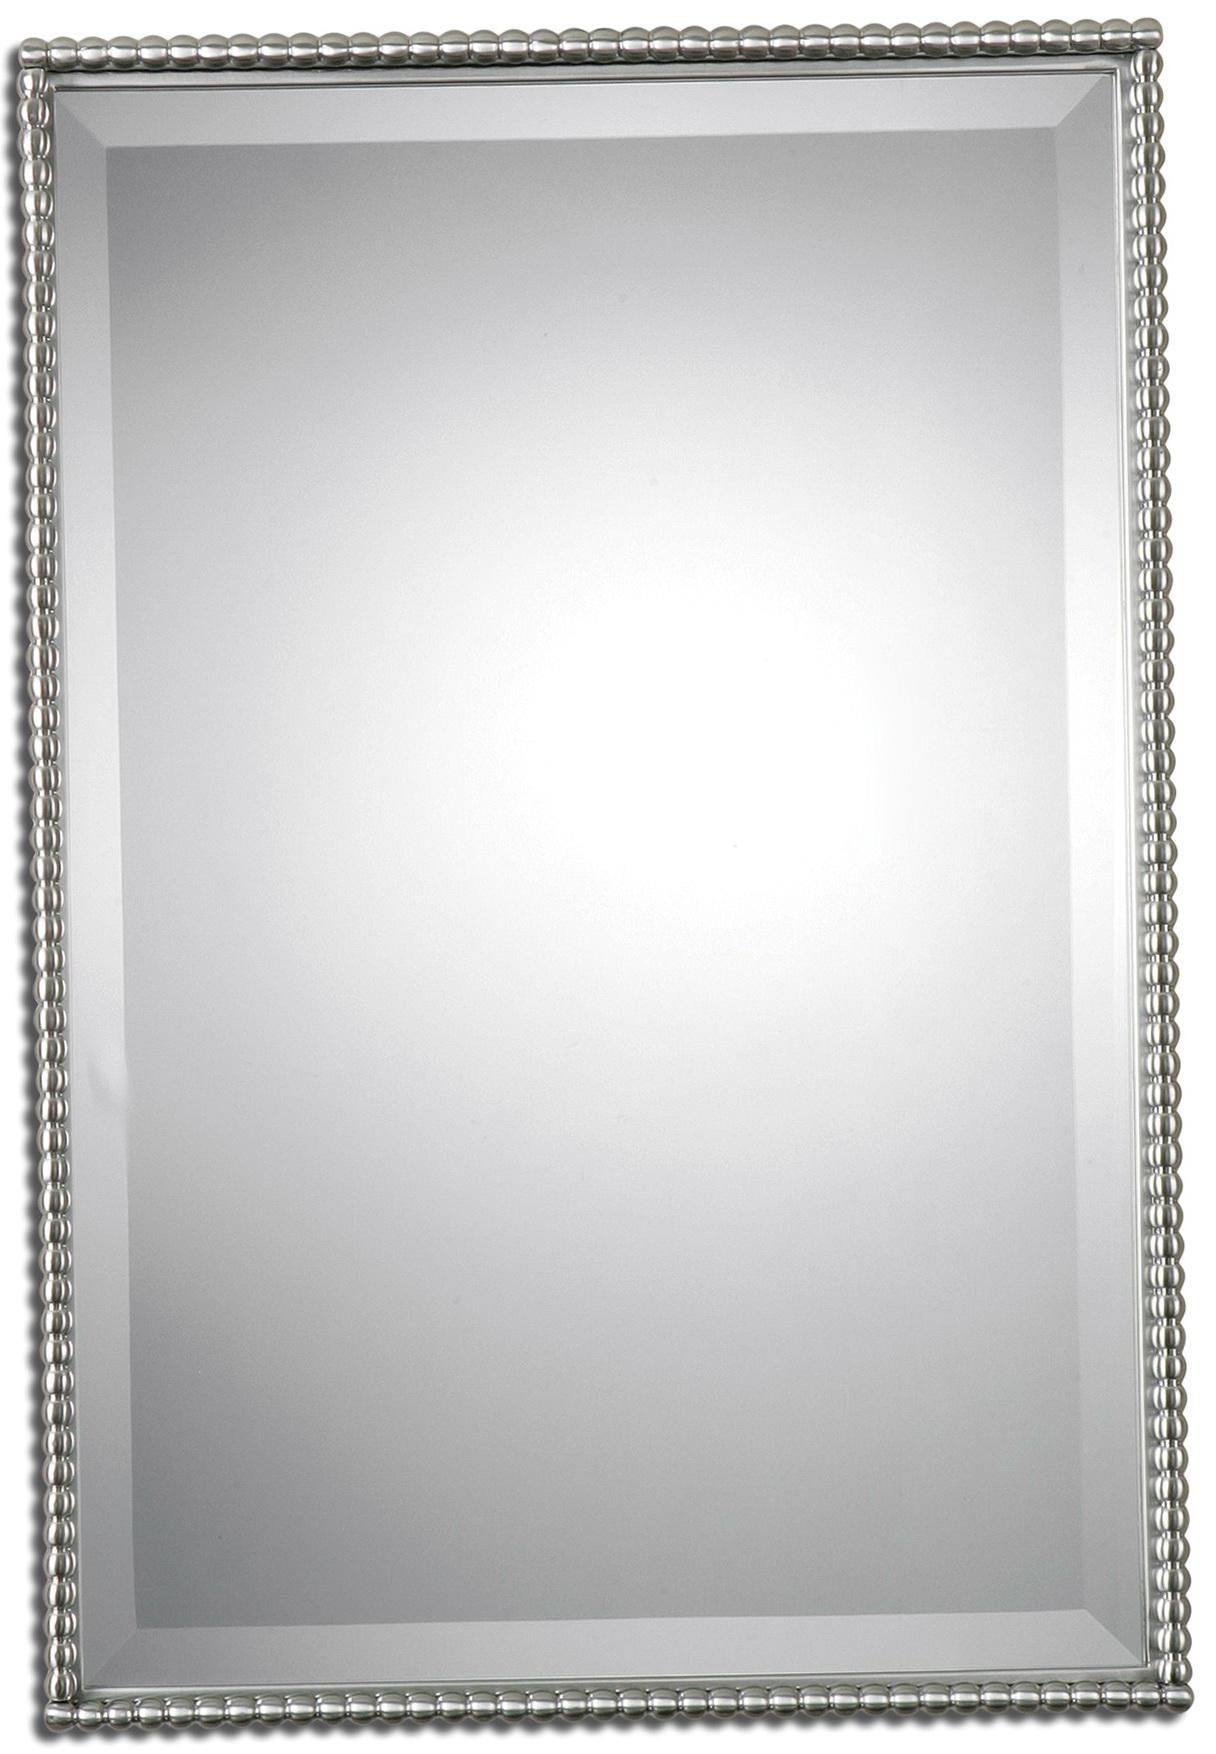 Brushed nickel mirror bathroom home design ideas Bathroom wall mirrors brushed nickel